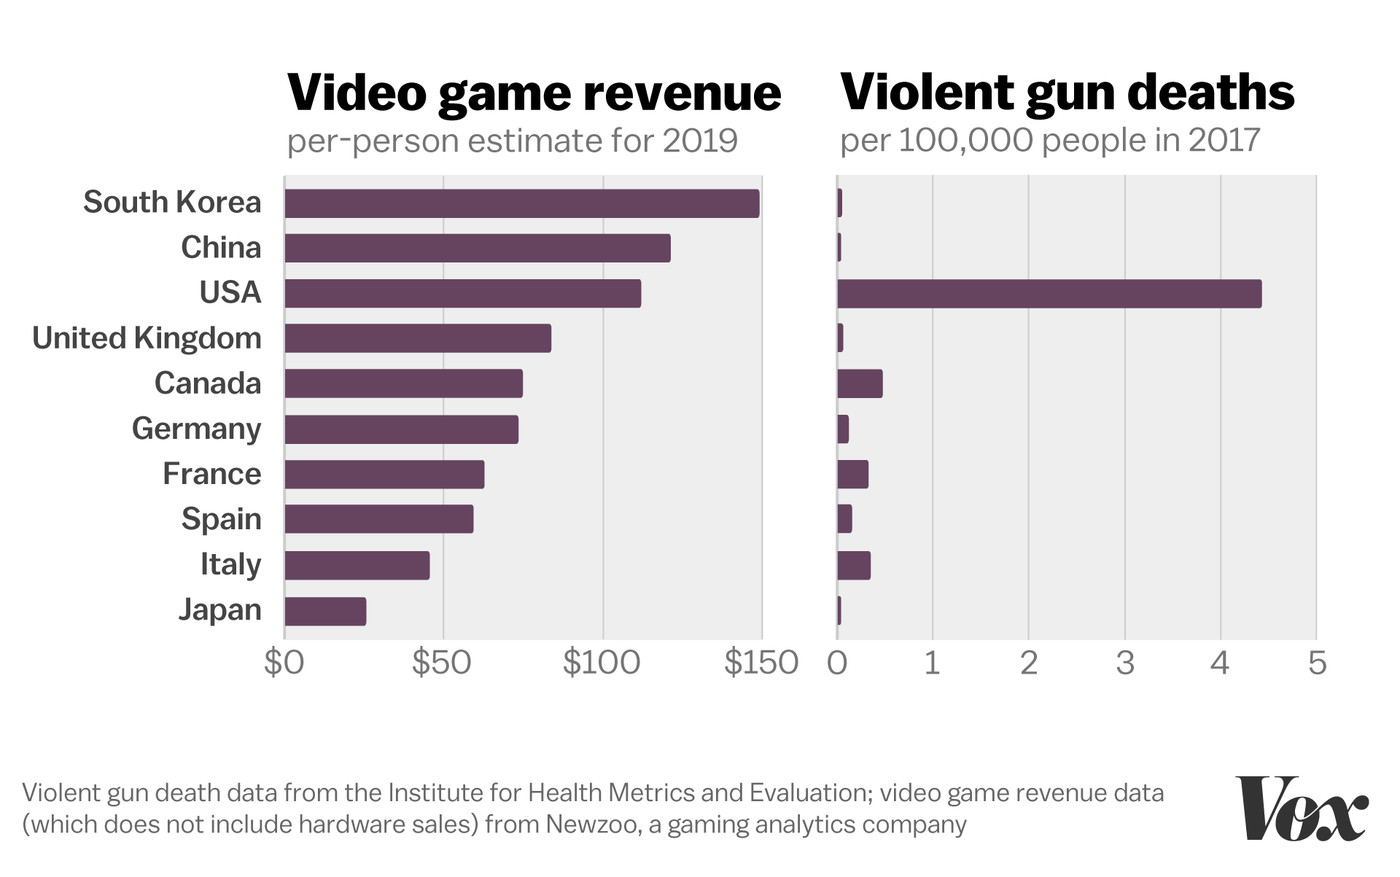 gun_death___video_game.png